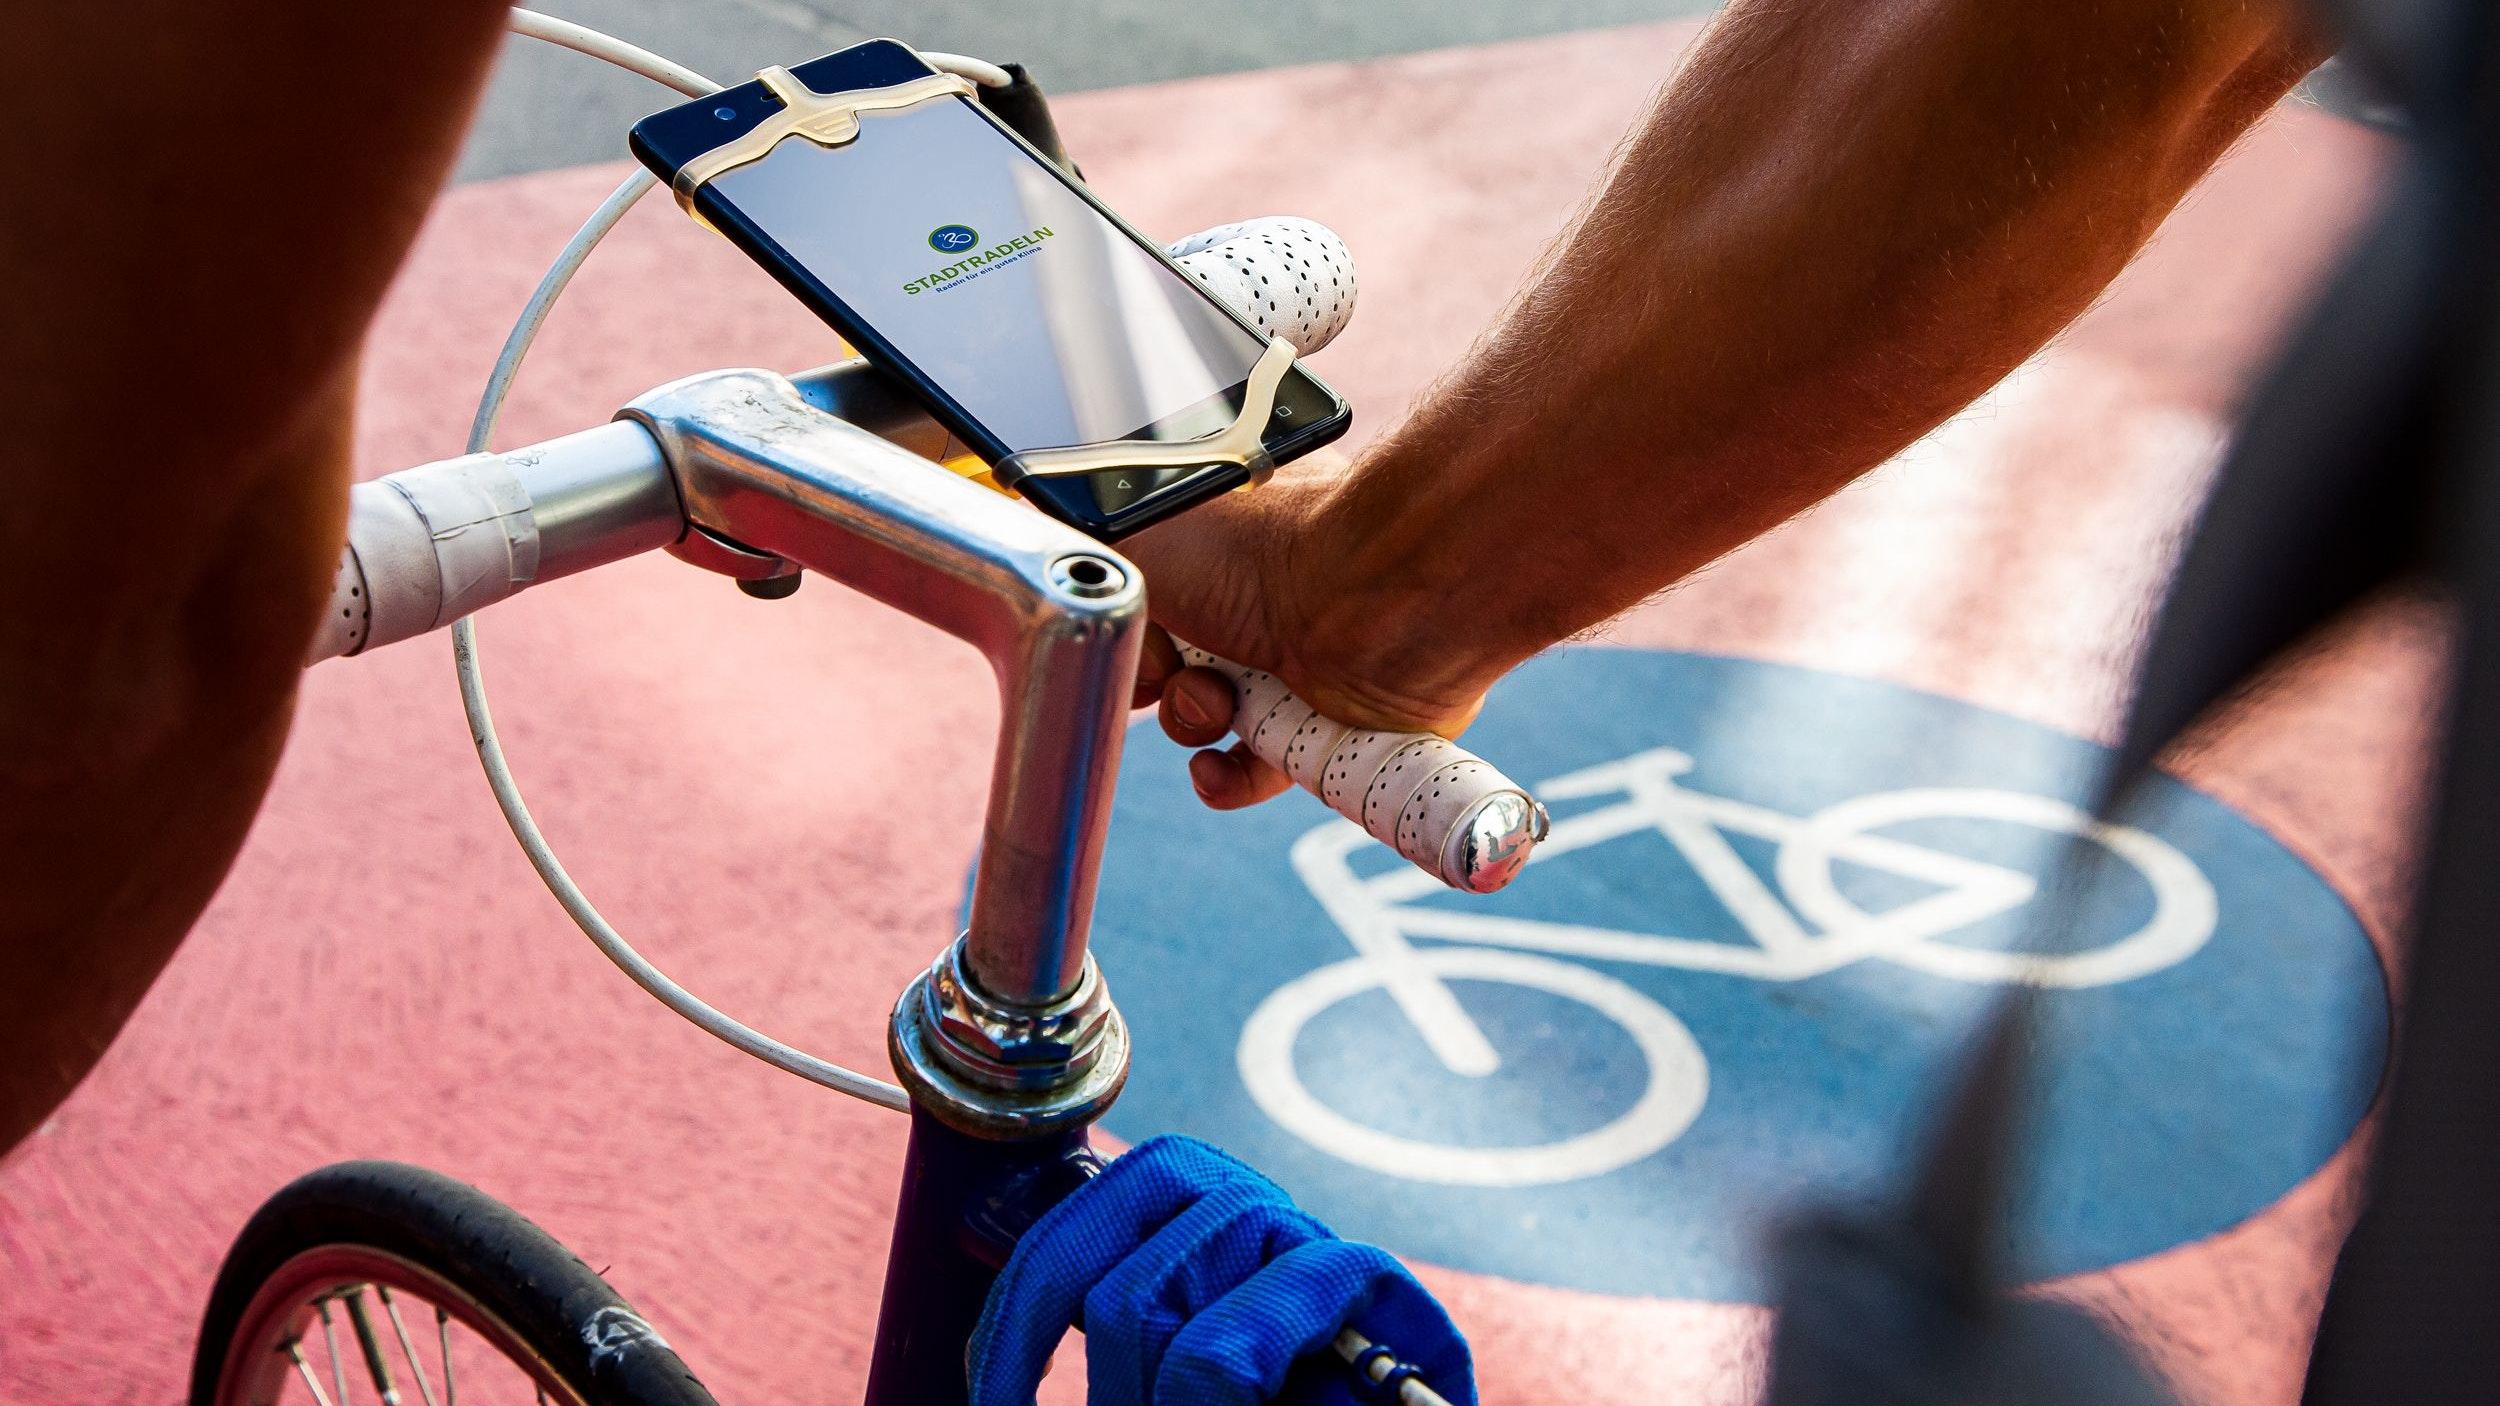 Stadtradeln ganz modern: Freunde der digitalen Welt können per Smartphone-App an der Klimaschutzaktion teilnehmen. Foto: Klima-Bündnis/Nickel